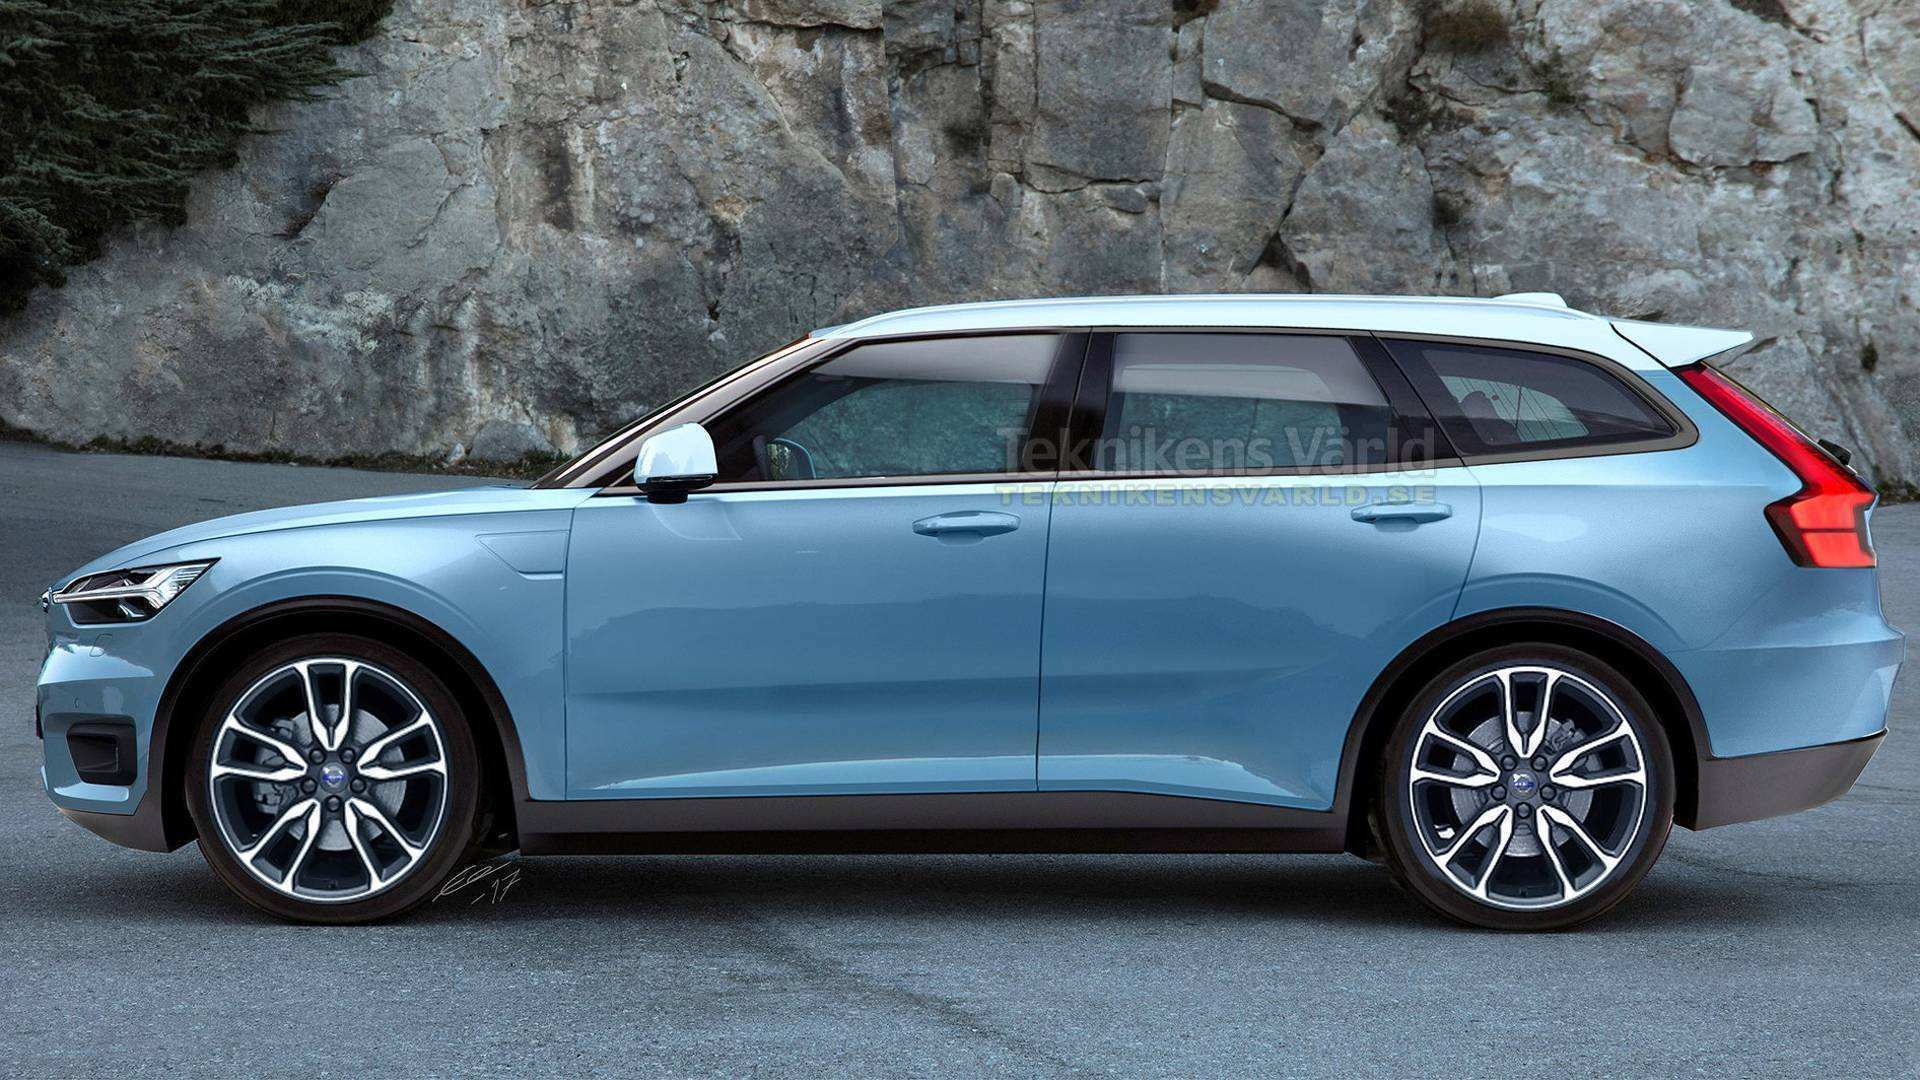 91 Concept of Volvo V40 2020 Usa Specs and Review for Volvo V40 2020 Usa